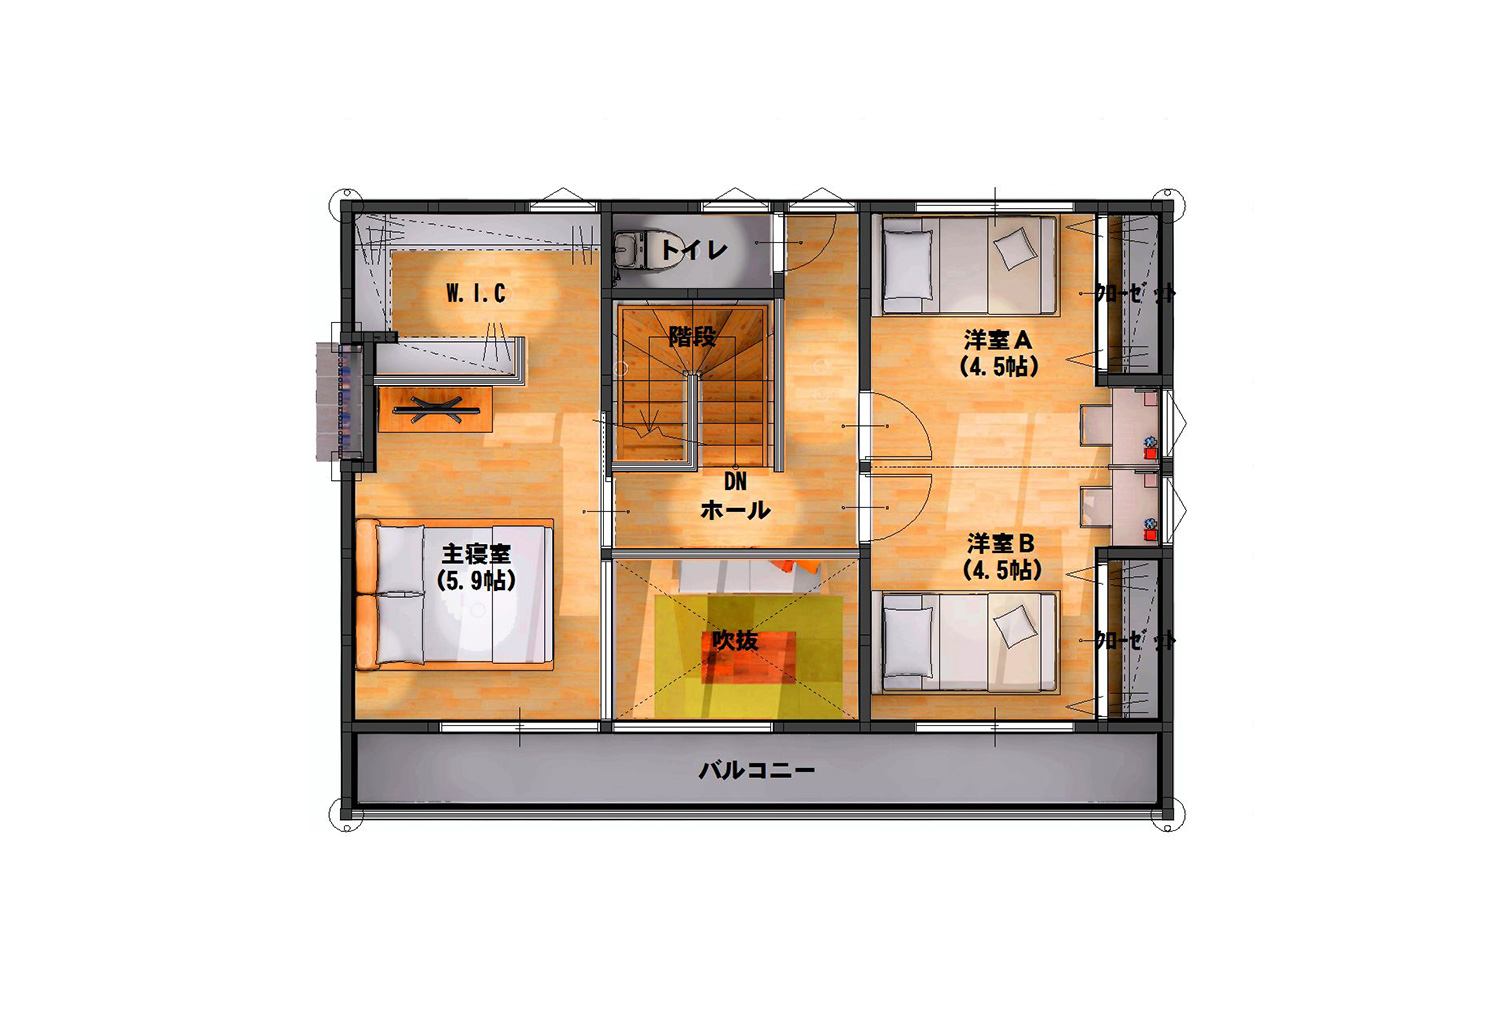 03 宮城県岩沼市吹上一丁目 3LDK (4LDKに変更可) 間取り図 2階